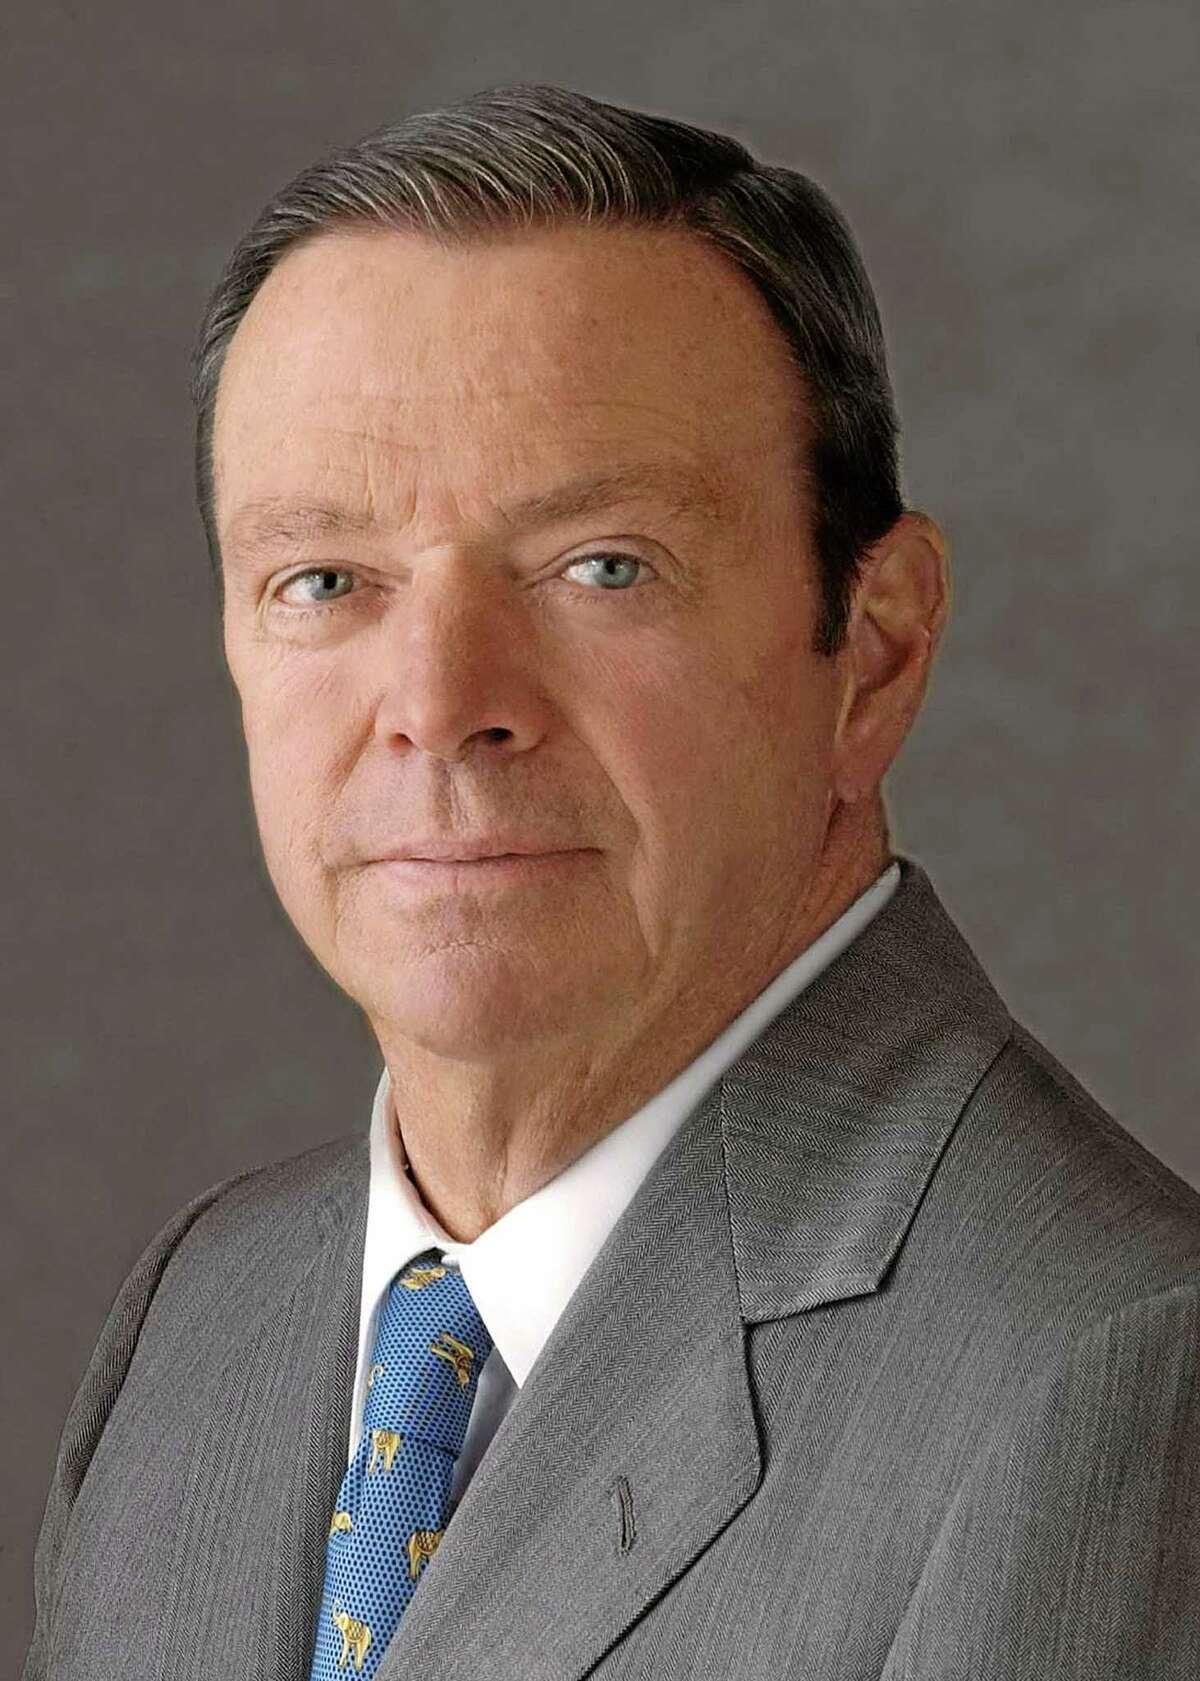 Former A-B CEO August A. Busch III.